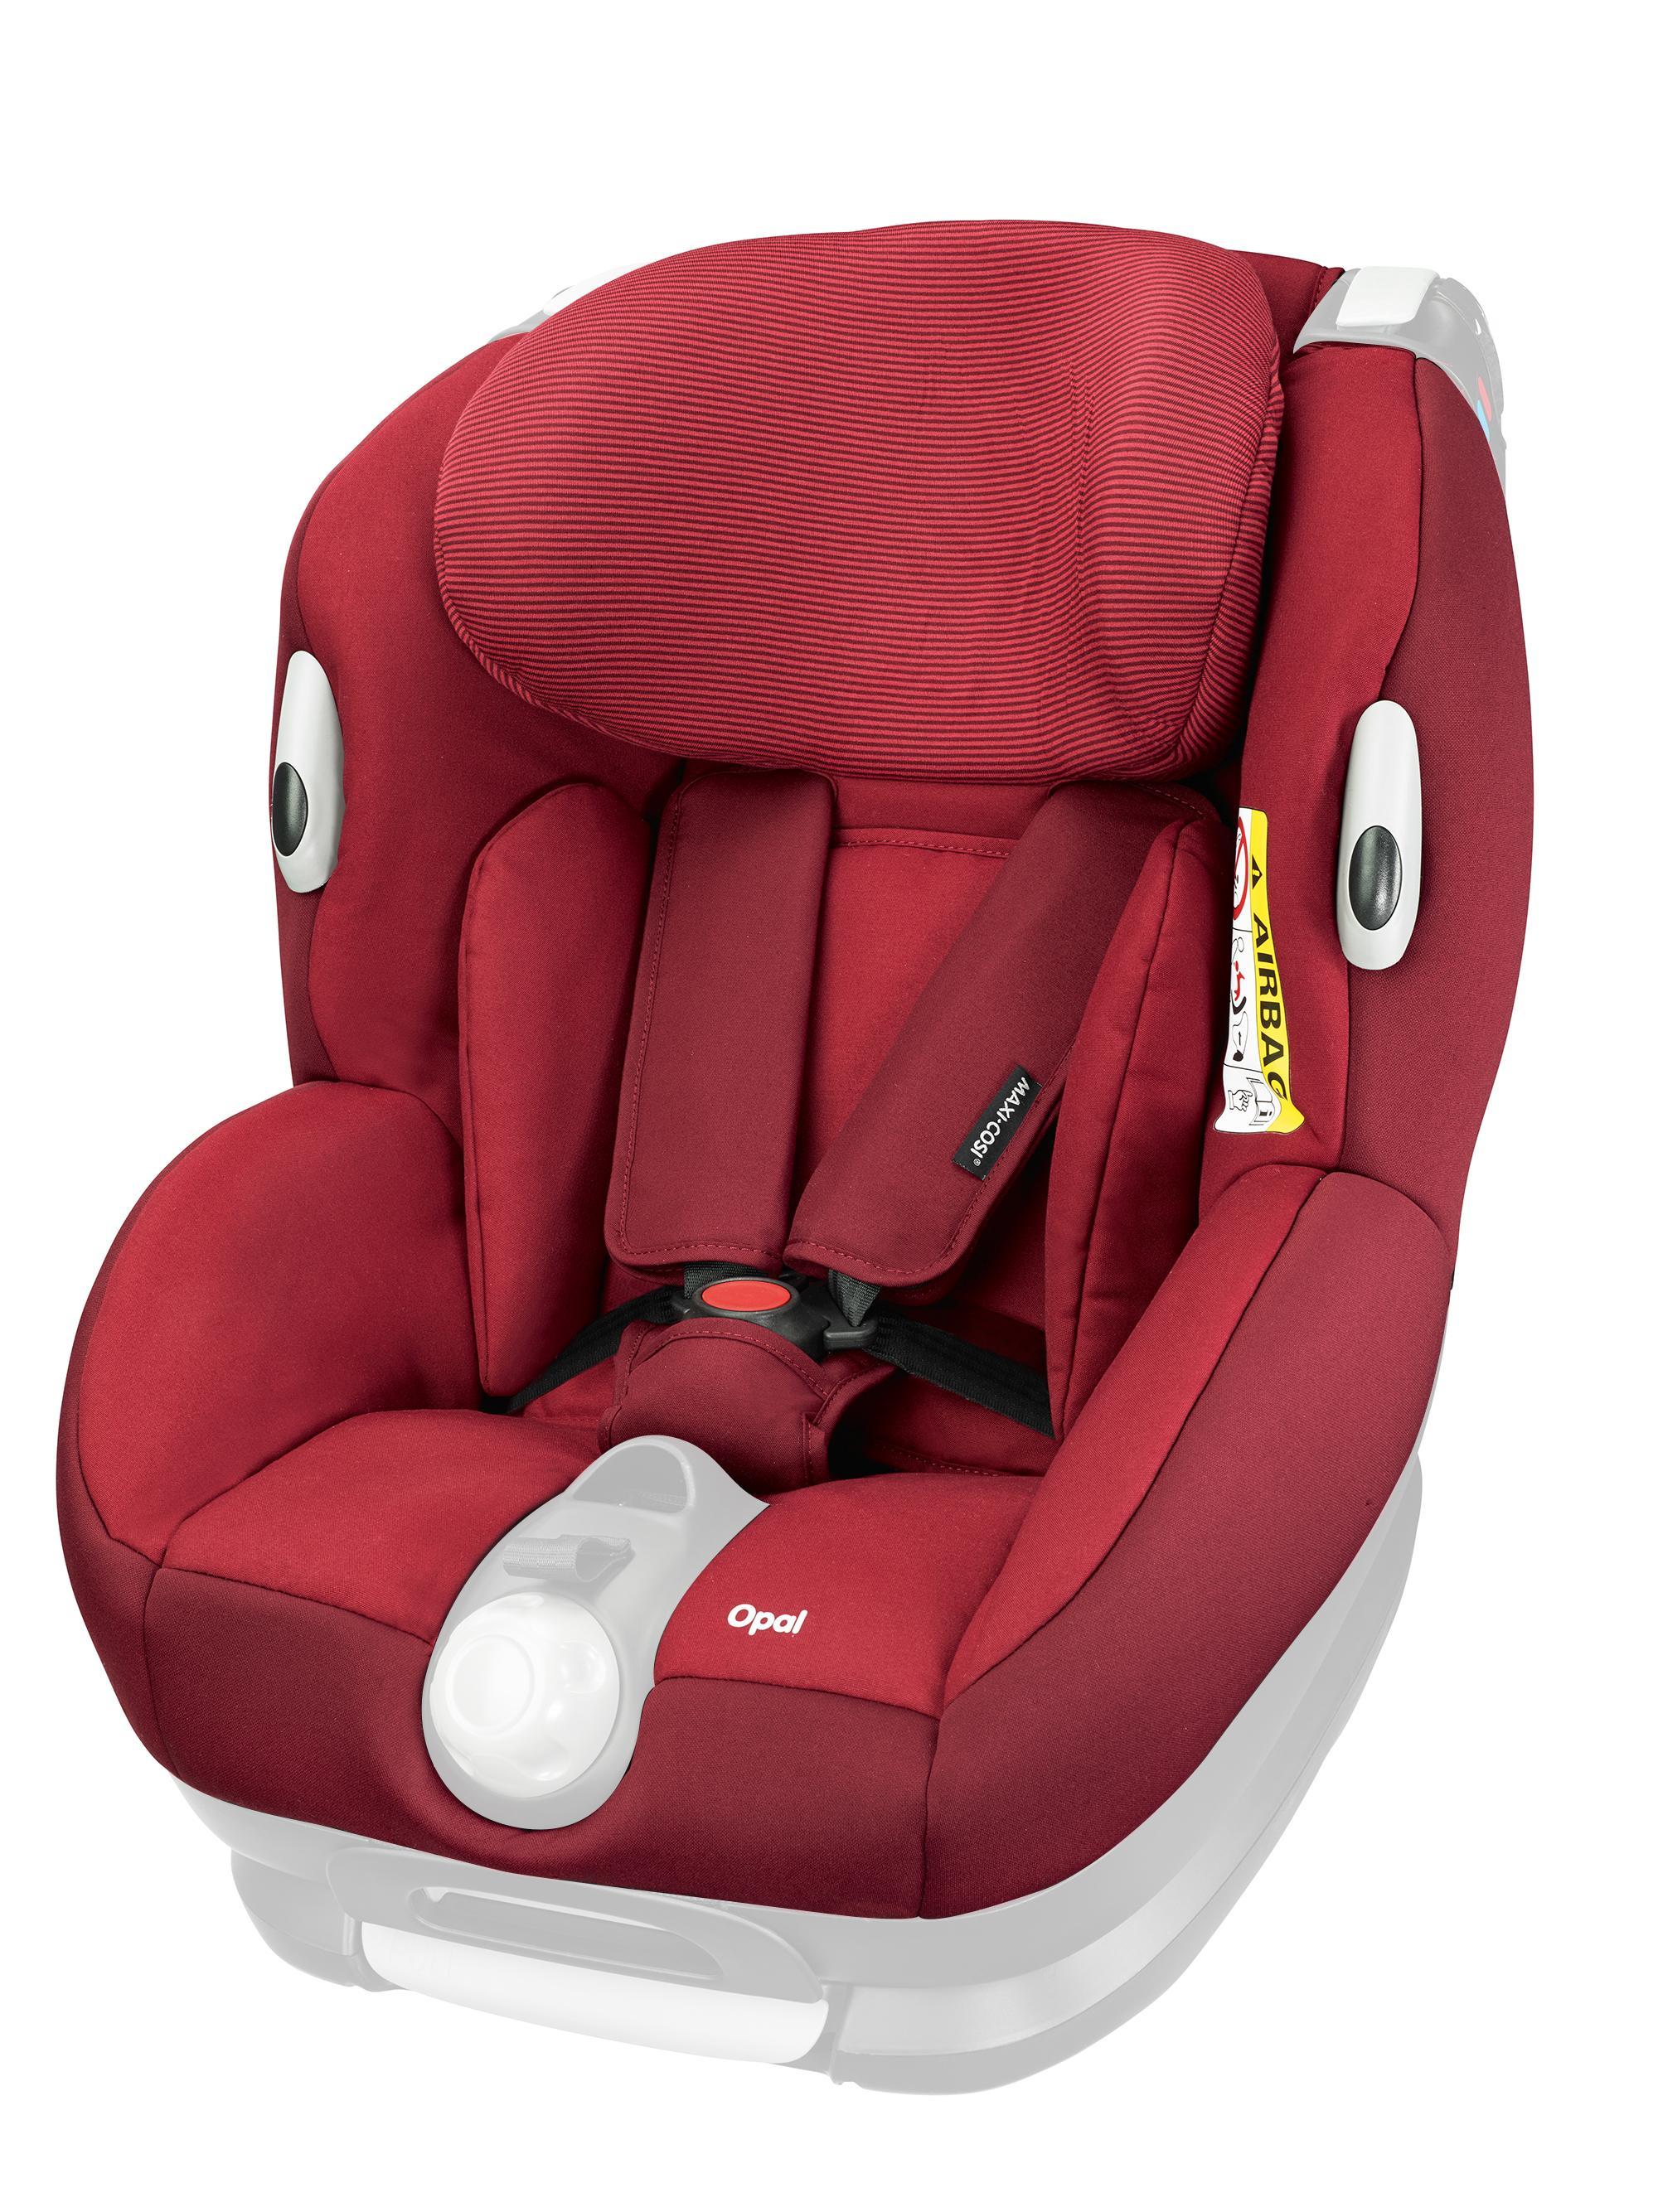 Maxi Cosi Opal Car Seat Review